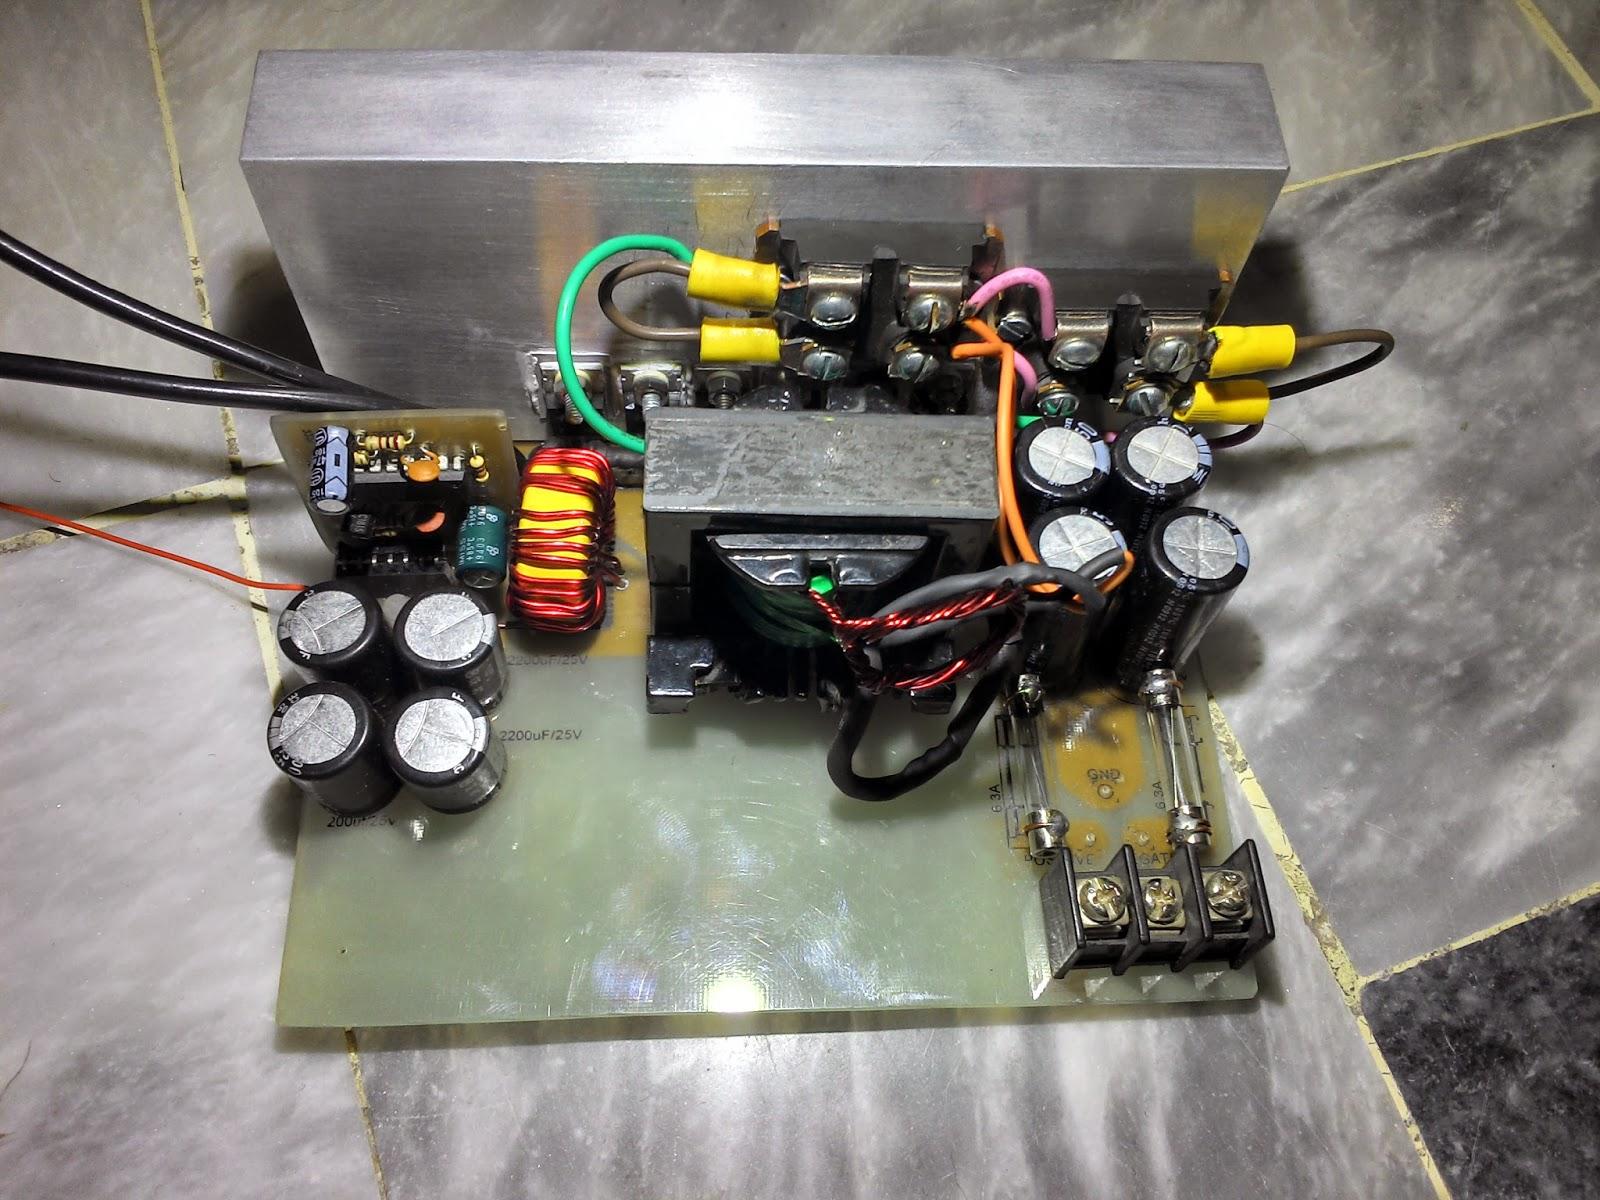 Mobile Zone Power Supply Circuit Diagram Seriesresonantpowersupply Powersupplycircuit